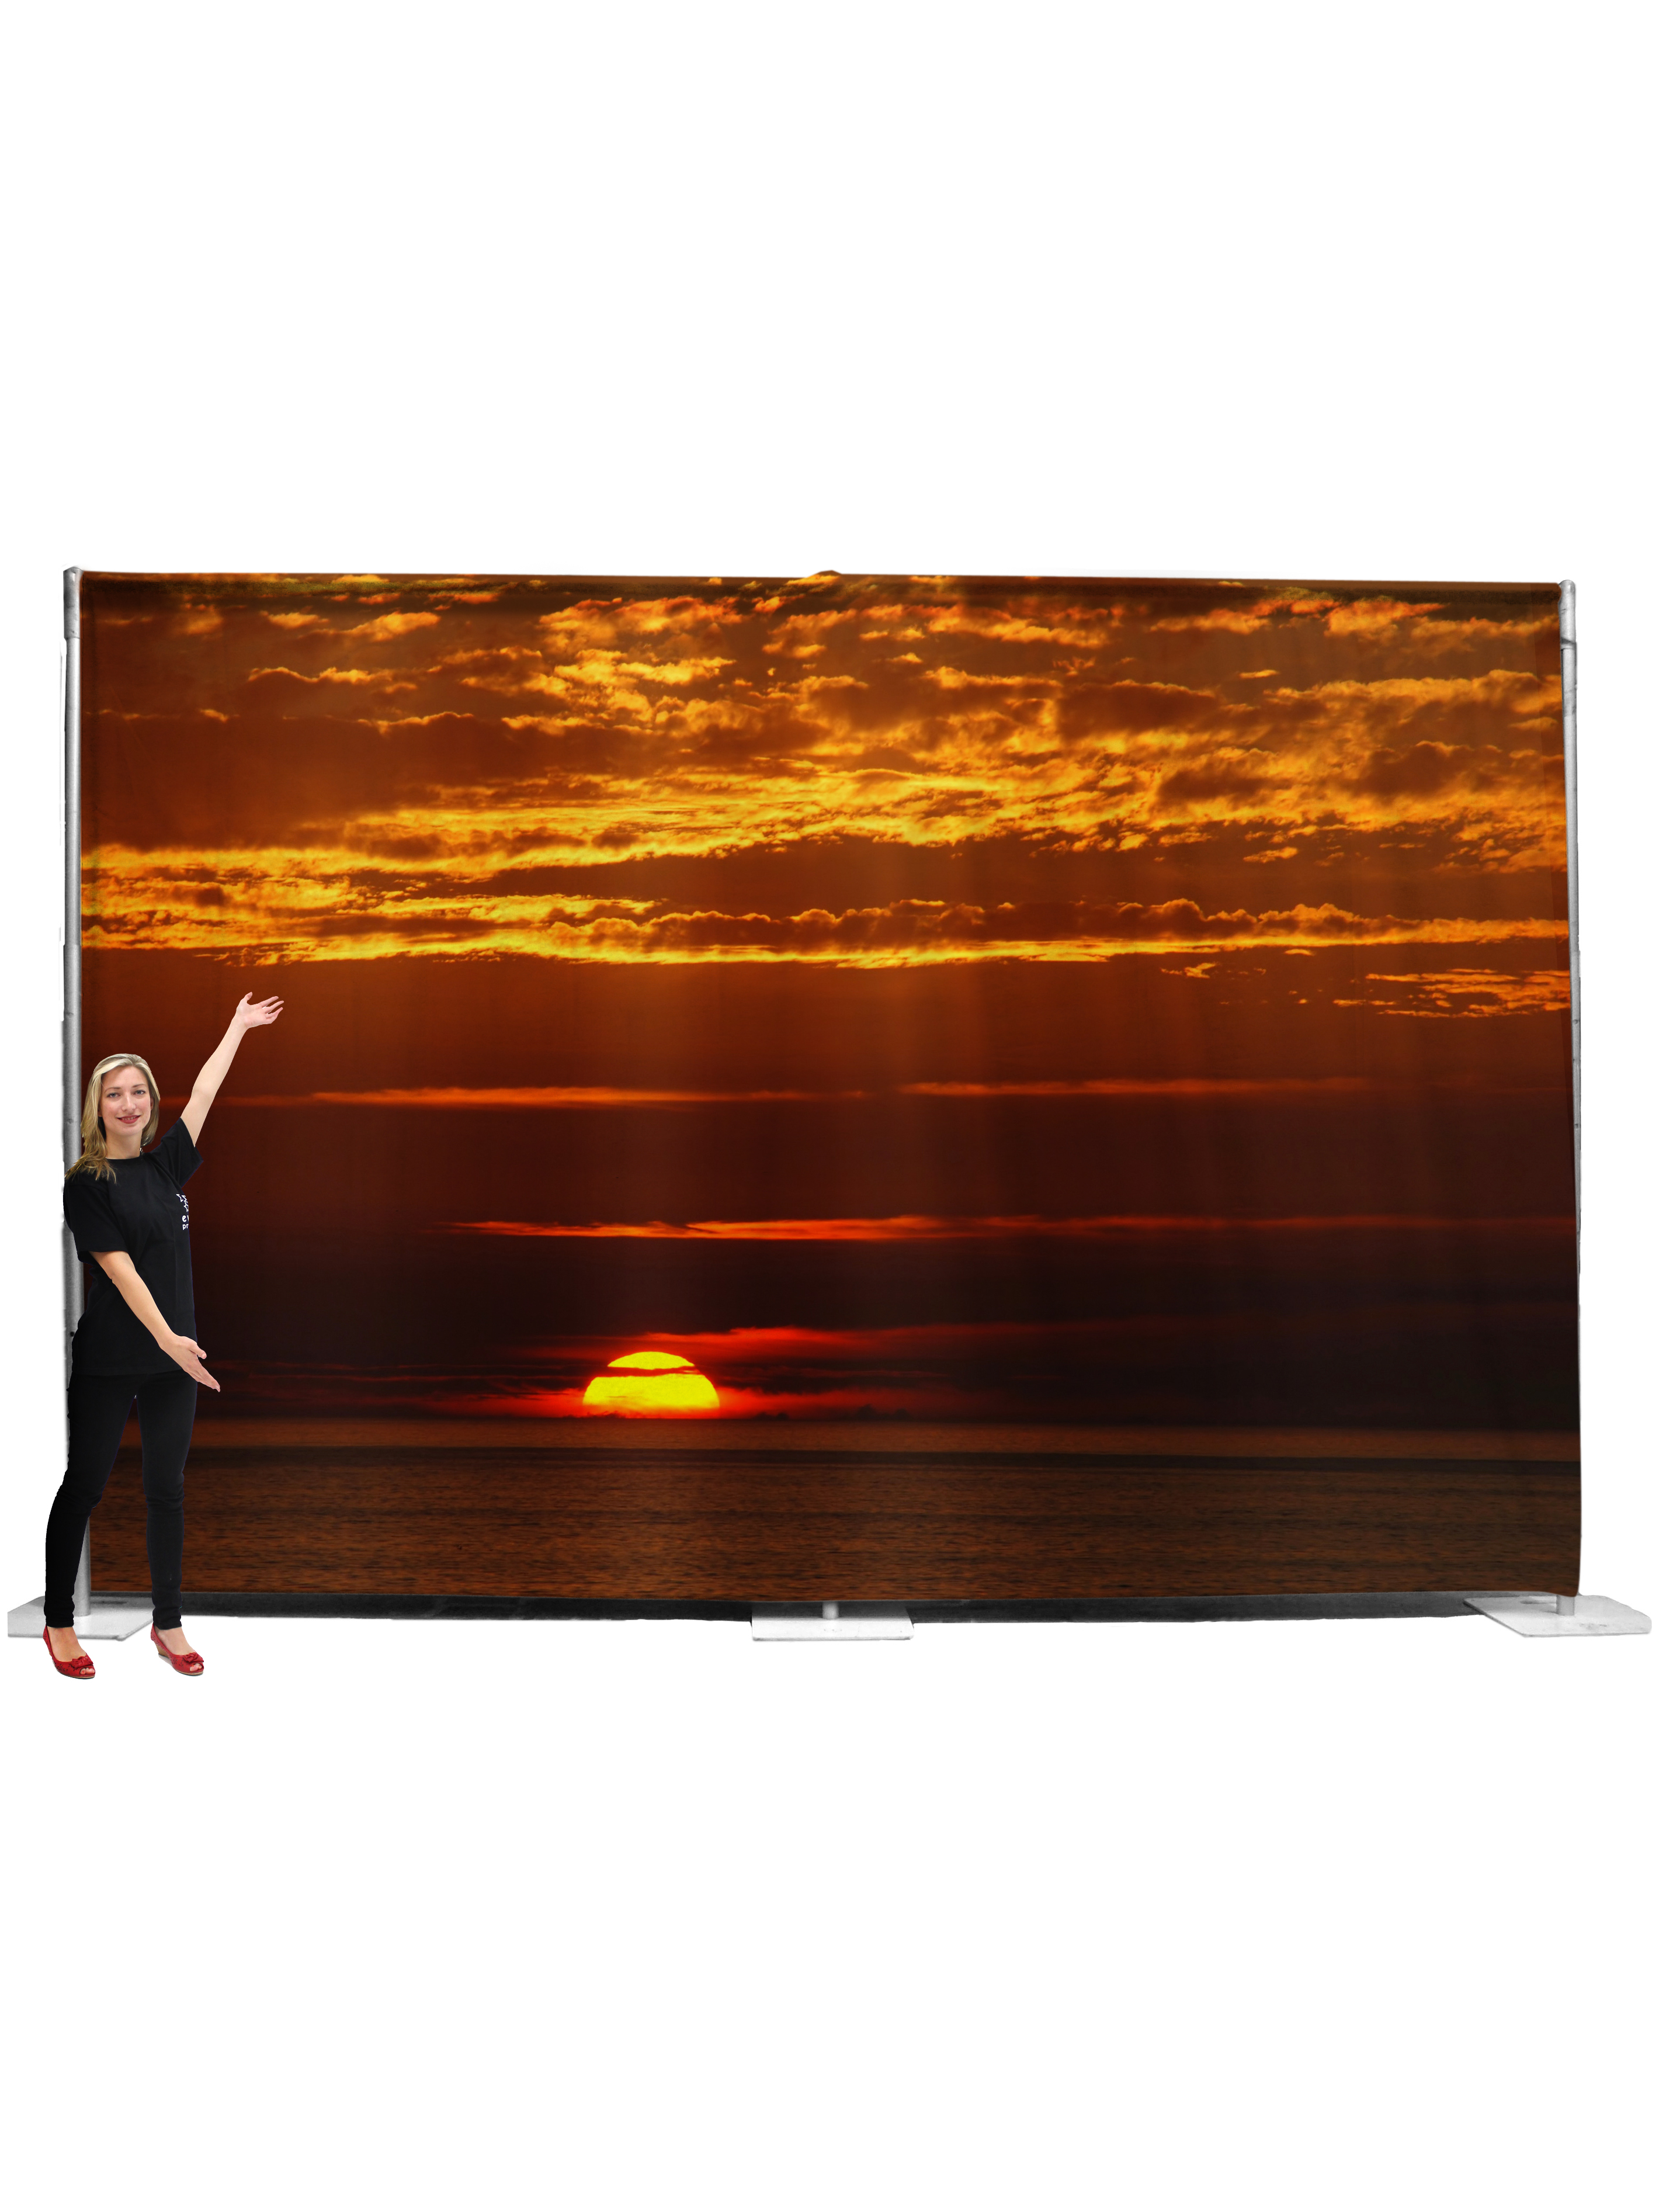 Sunset Backdrop #2 (4 5m x 3m)